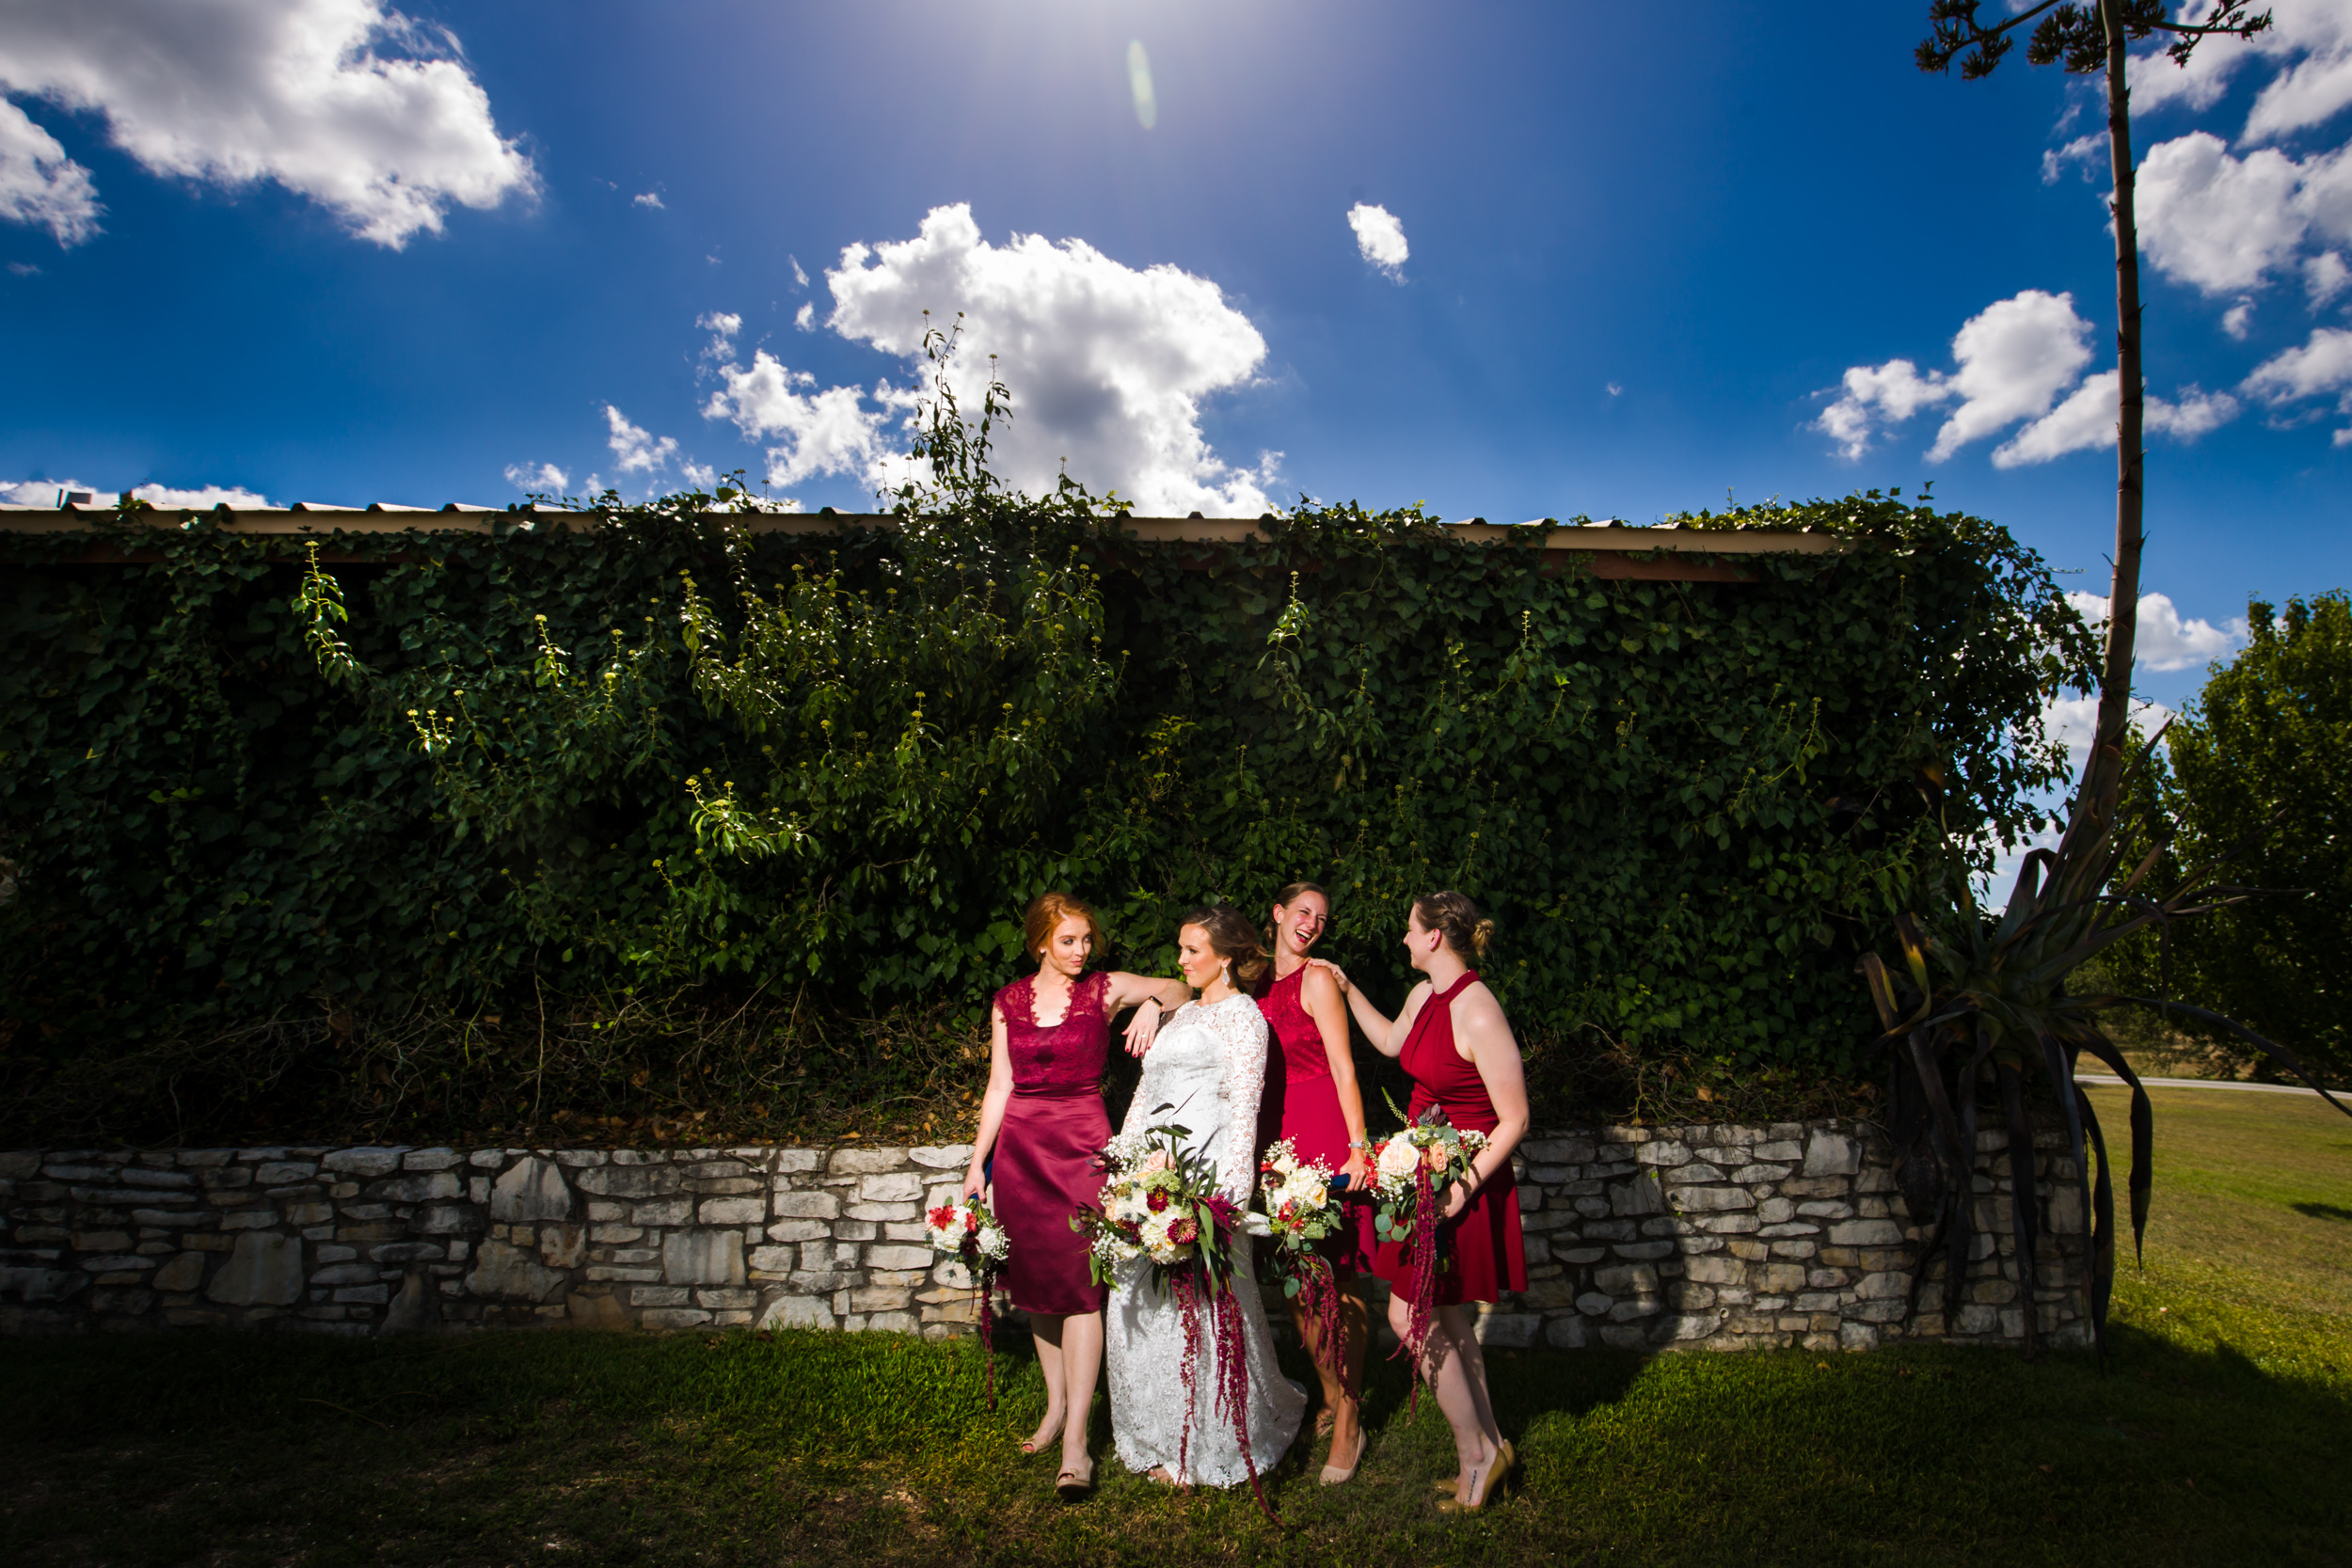 austin-wedding-colorful-16.jpg